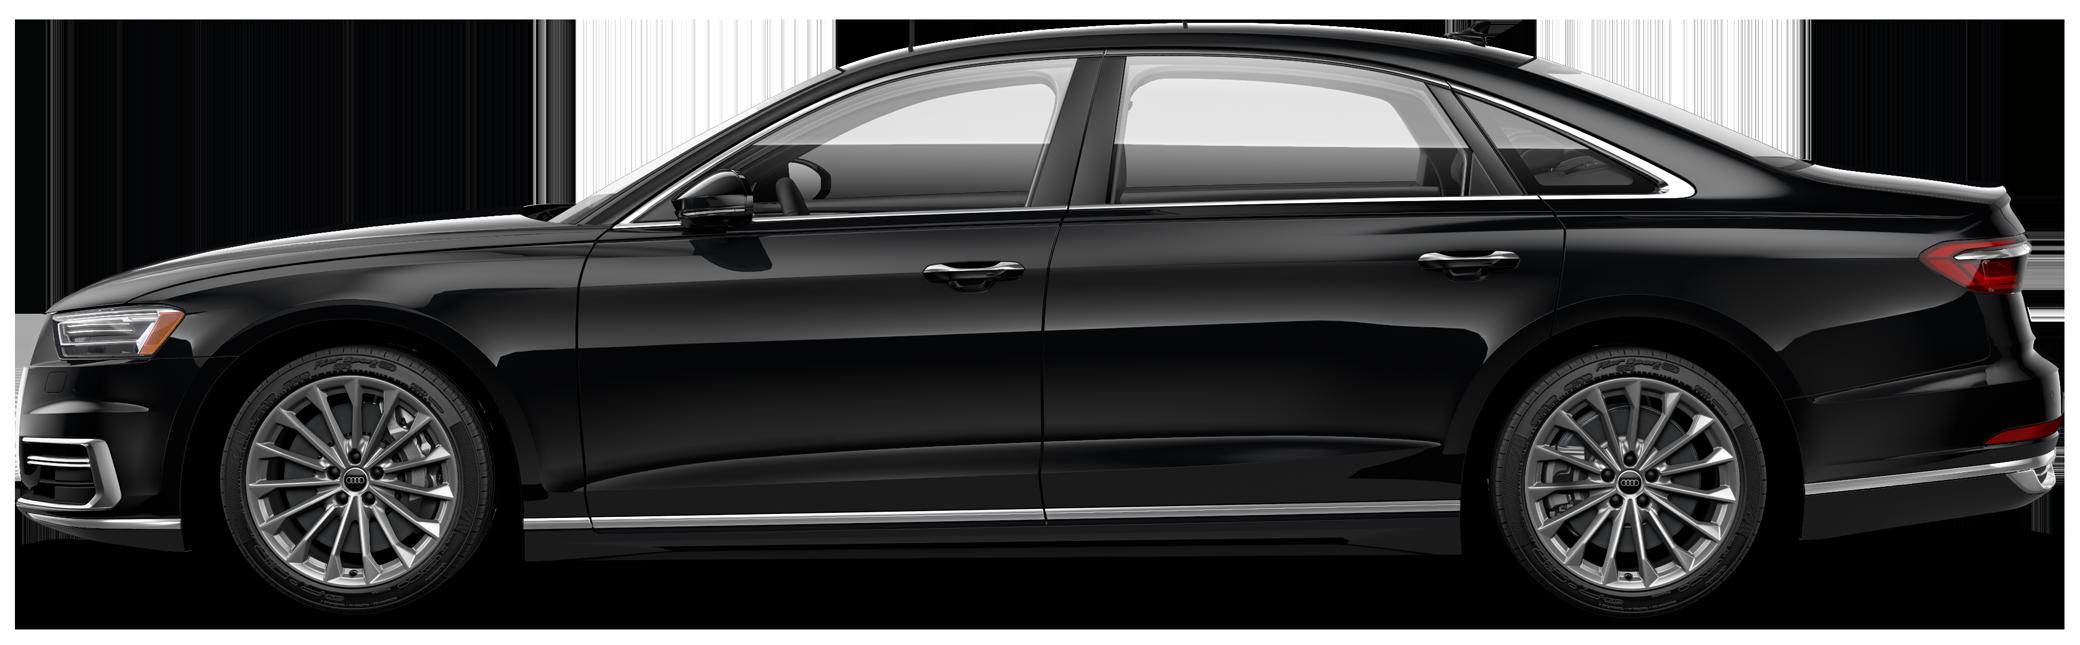 2021 Audi A8 Sedan L 55